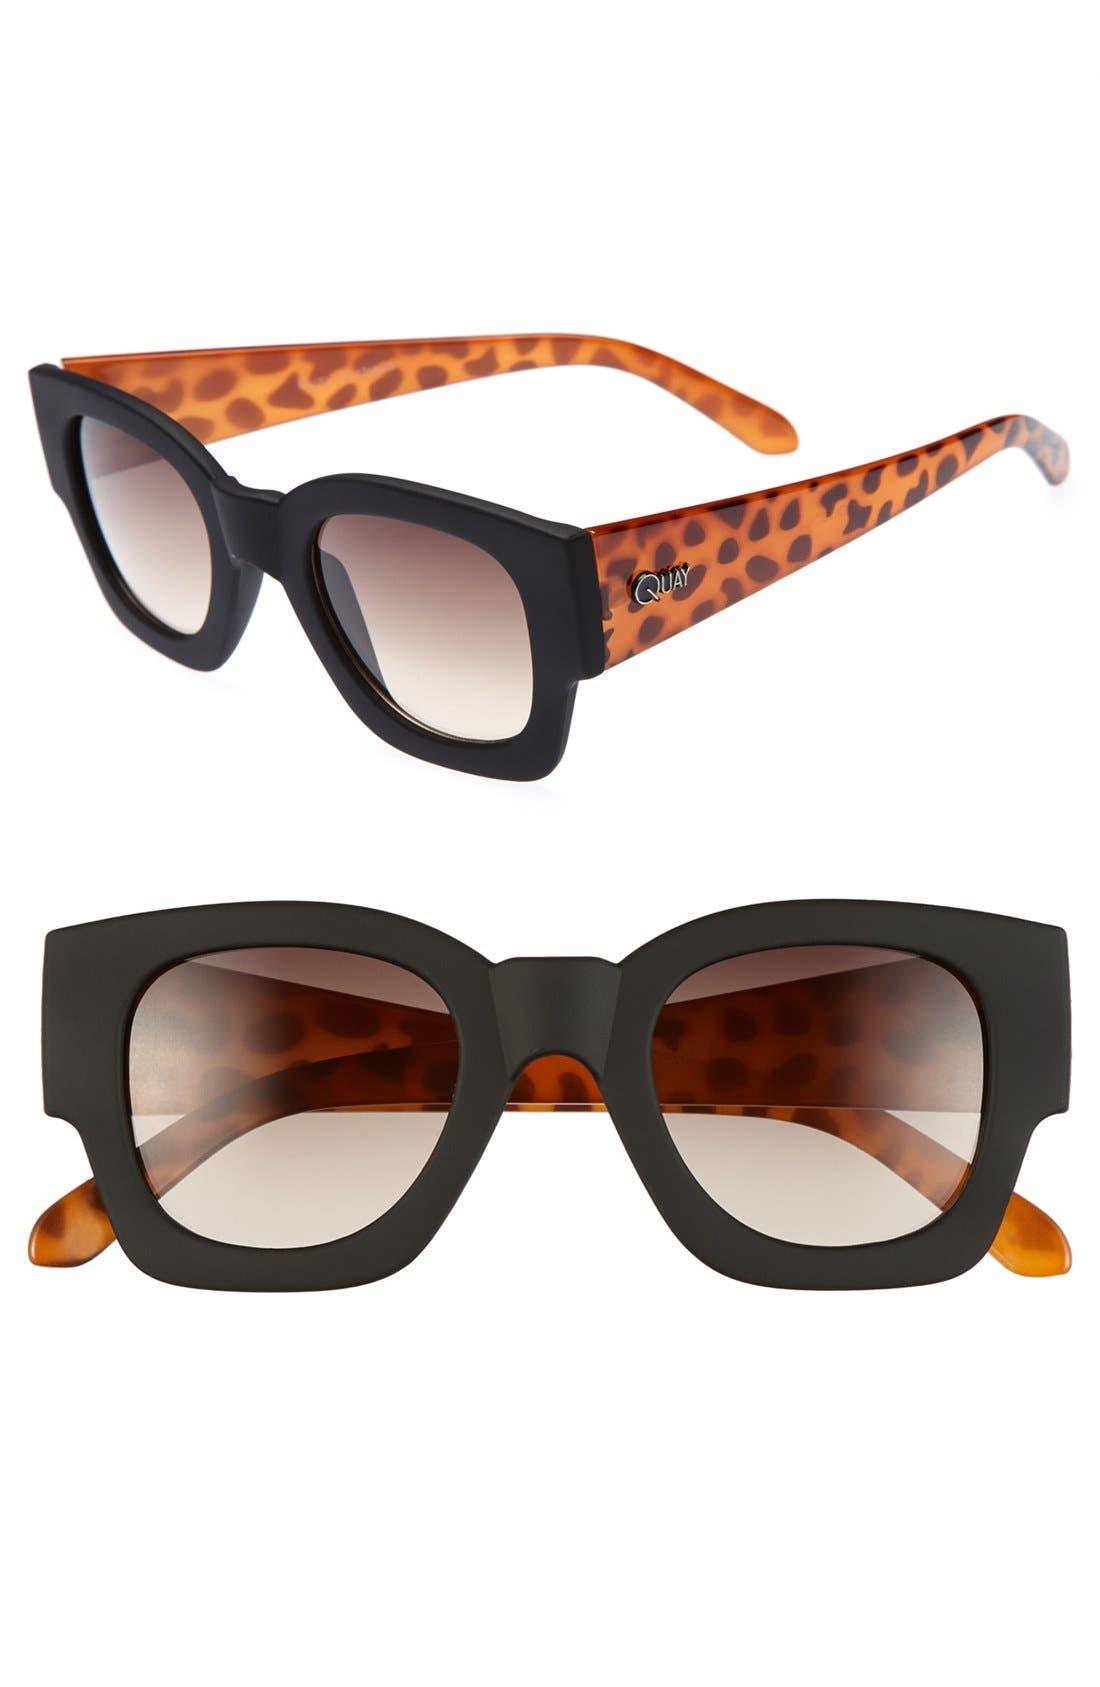 Main Image - Quay 'Polygon' 50mm Sunglasses